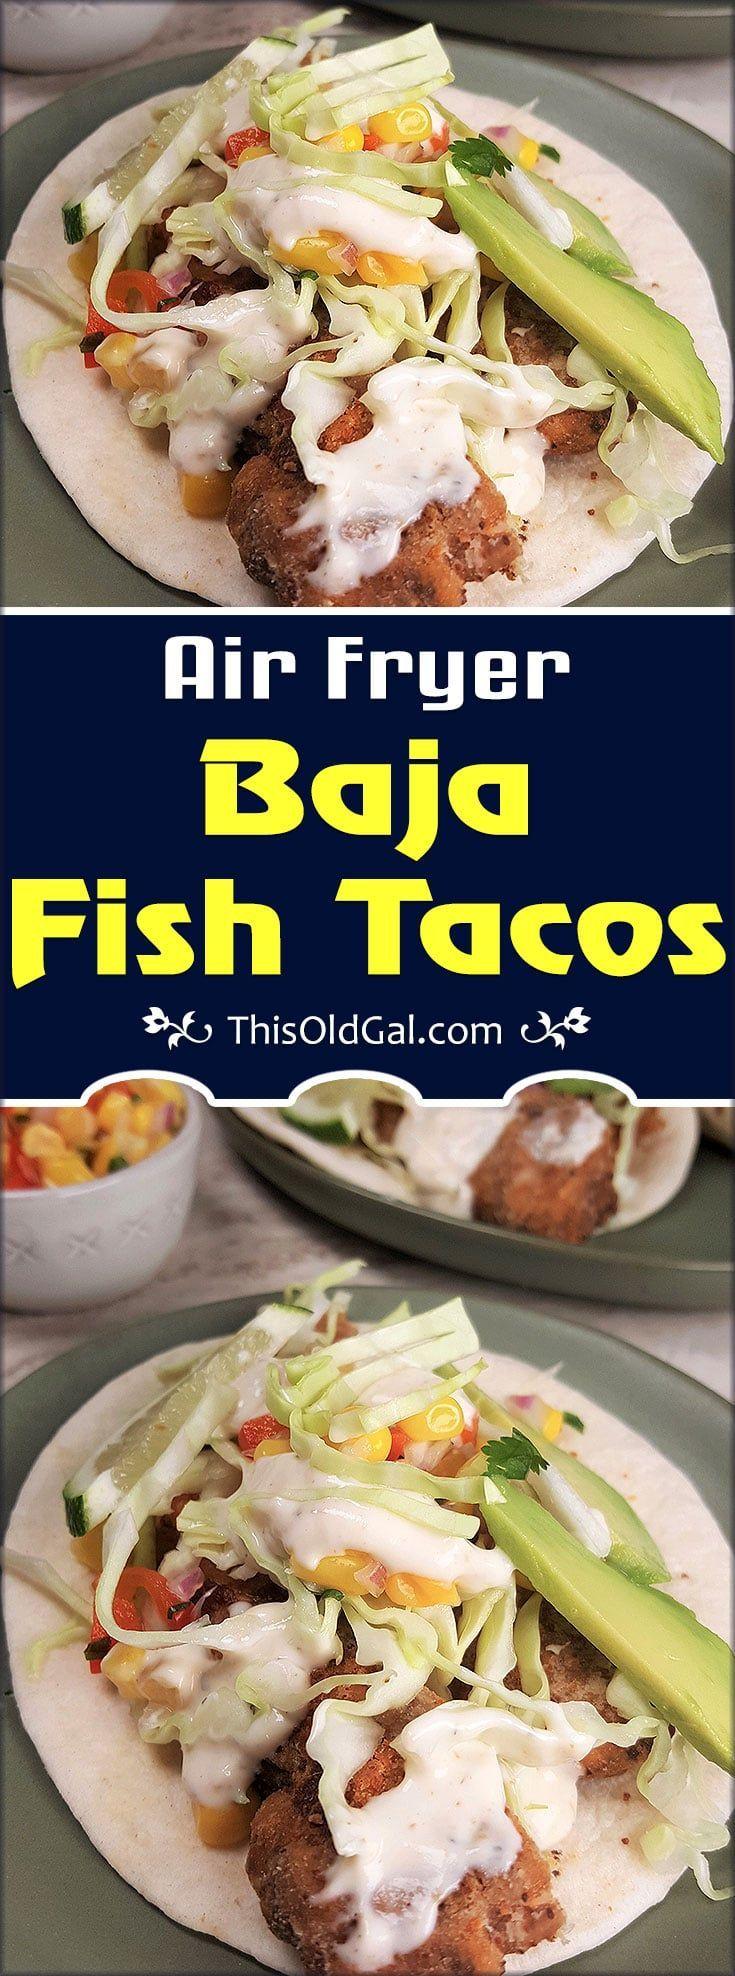 Air Fryer Baja California Fish Tacos Air fryer recipes